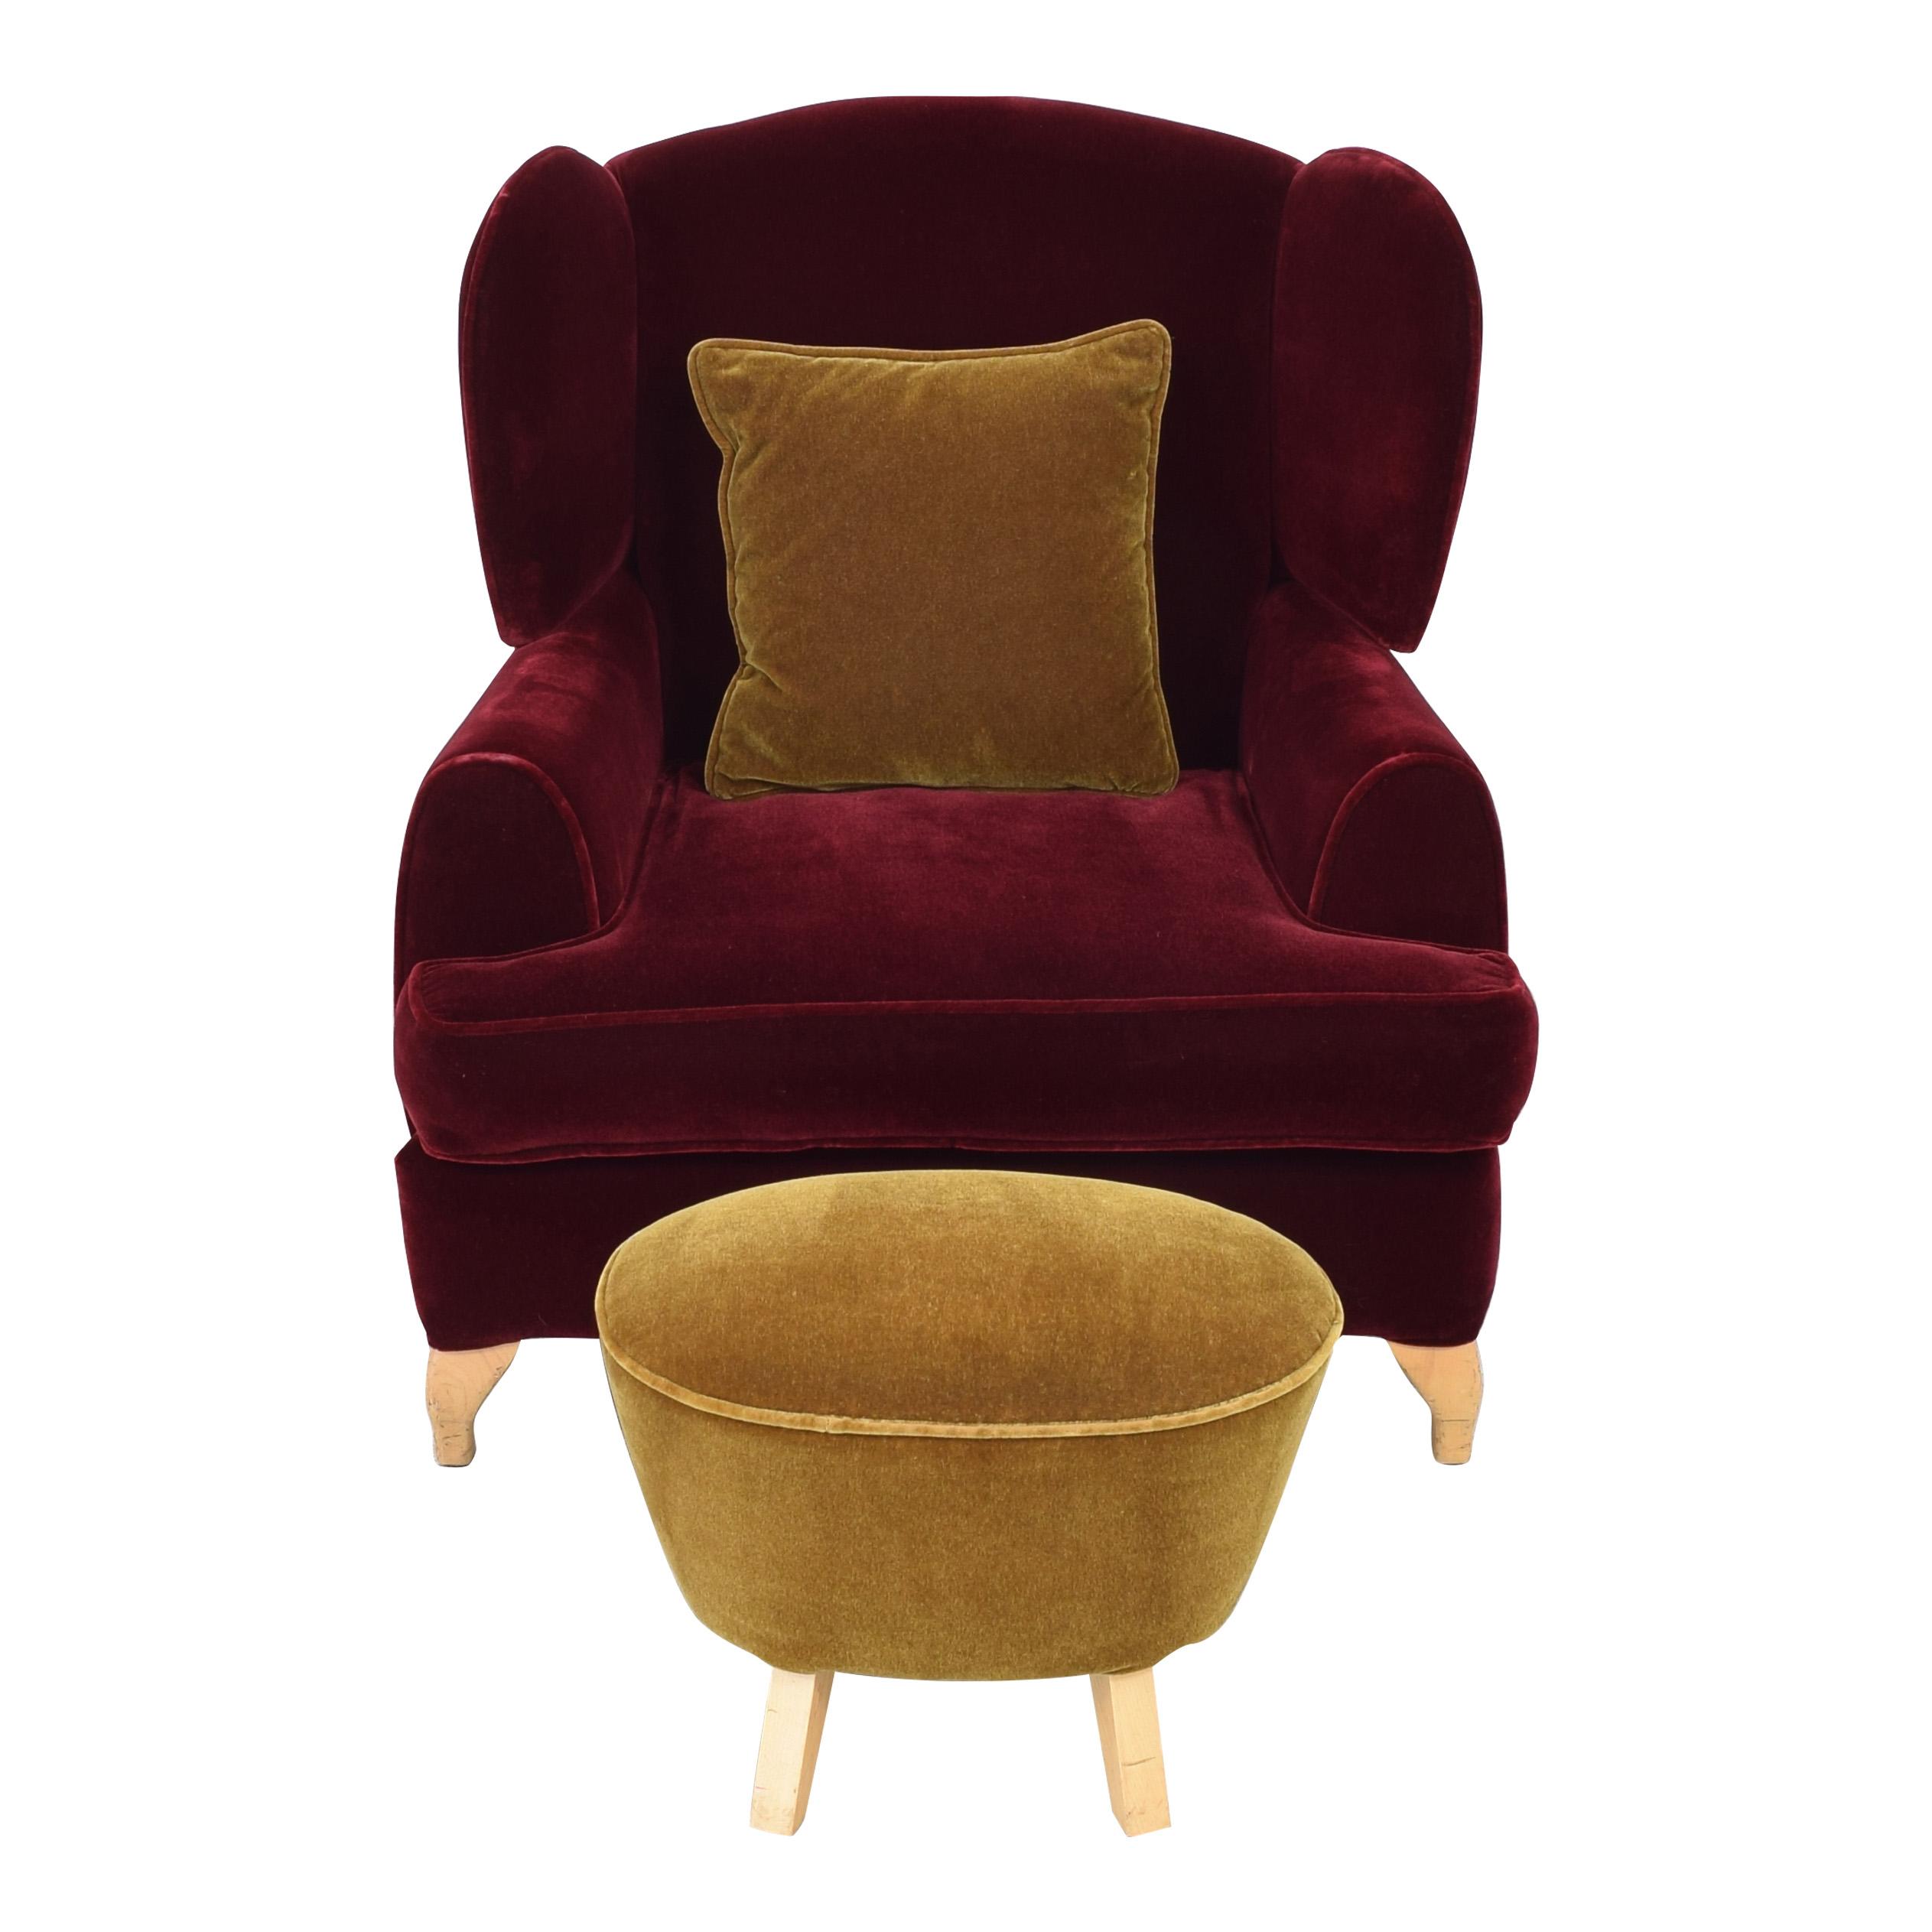 Custom Wingback Chair and Ottoman nyc